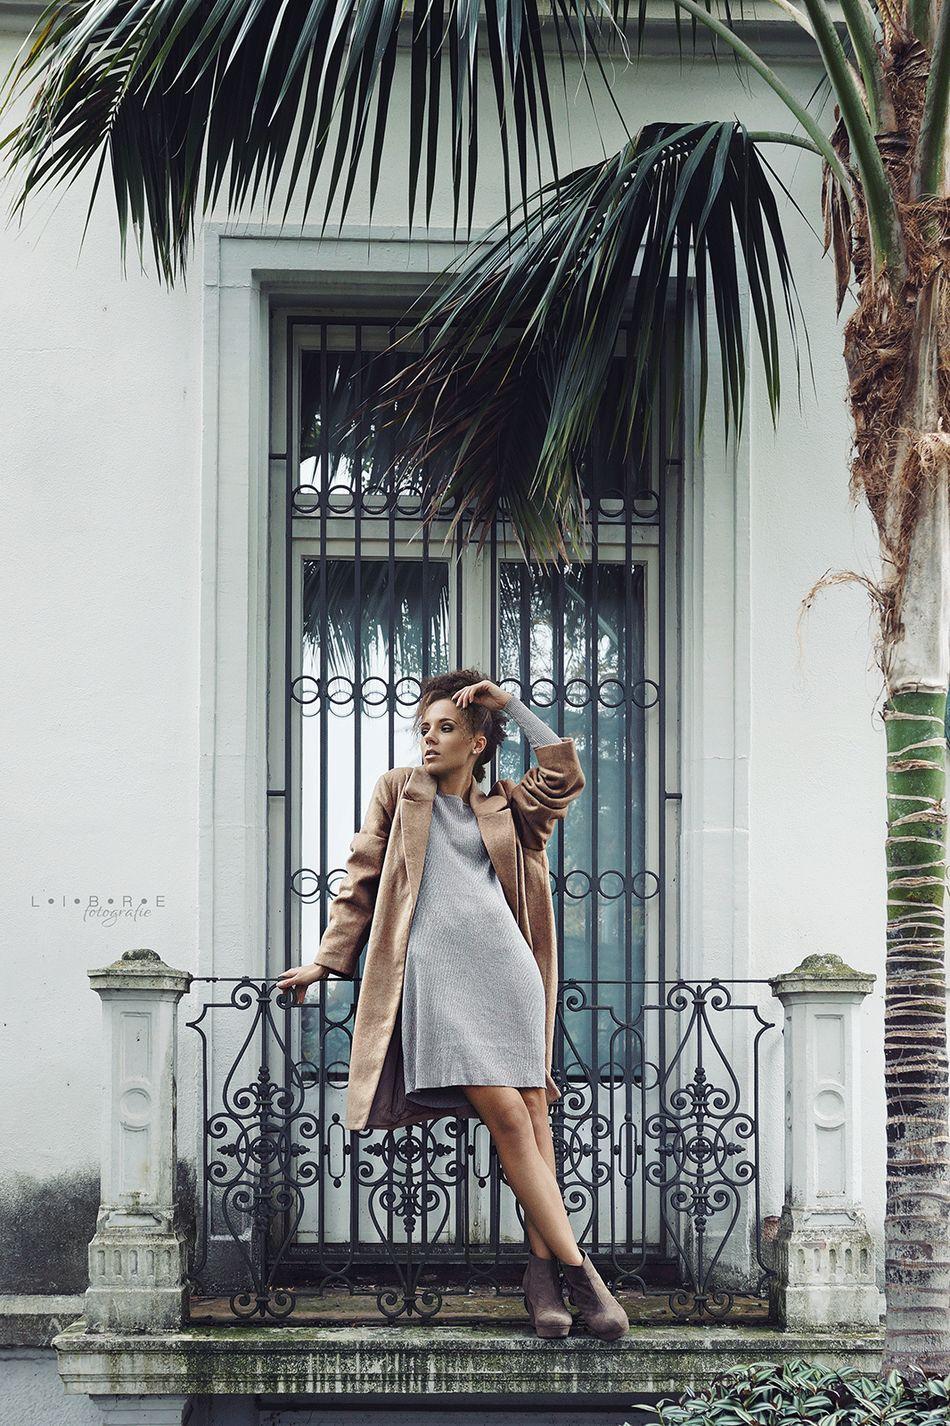 Bored in Paradise ◾Model: Marlen ◾Makeup by Emma Teichrieb ◾ Fashion Fashionphotography Palm Trees Curls Glamorous  Luxury Luxurylifestyle  Photography Photographer Bonn Bawü Lahr